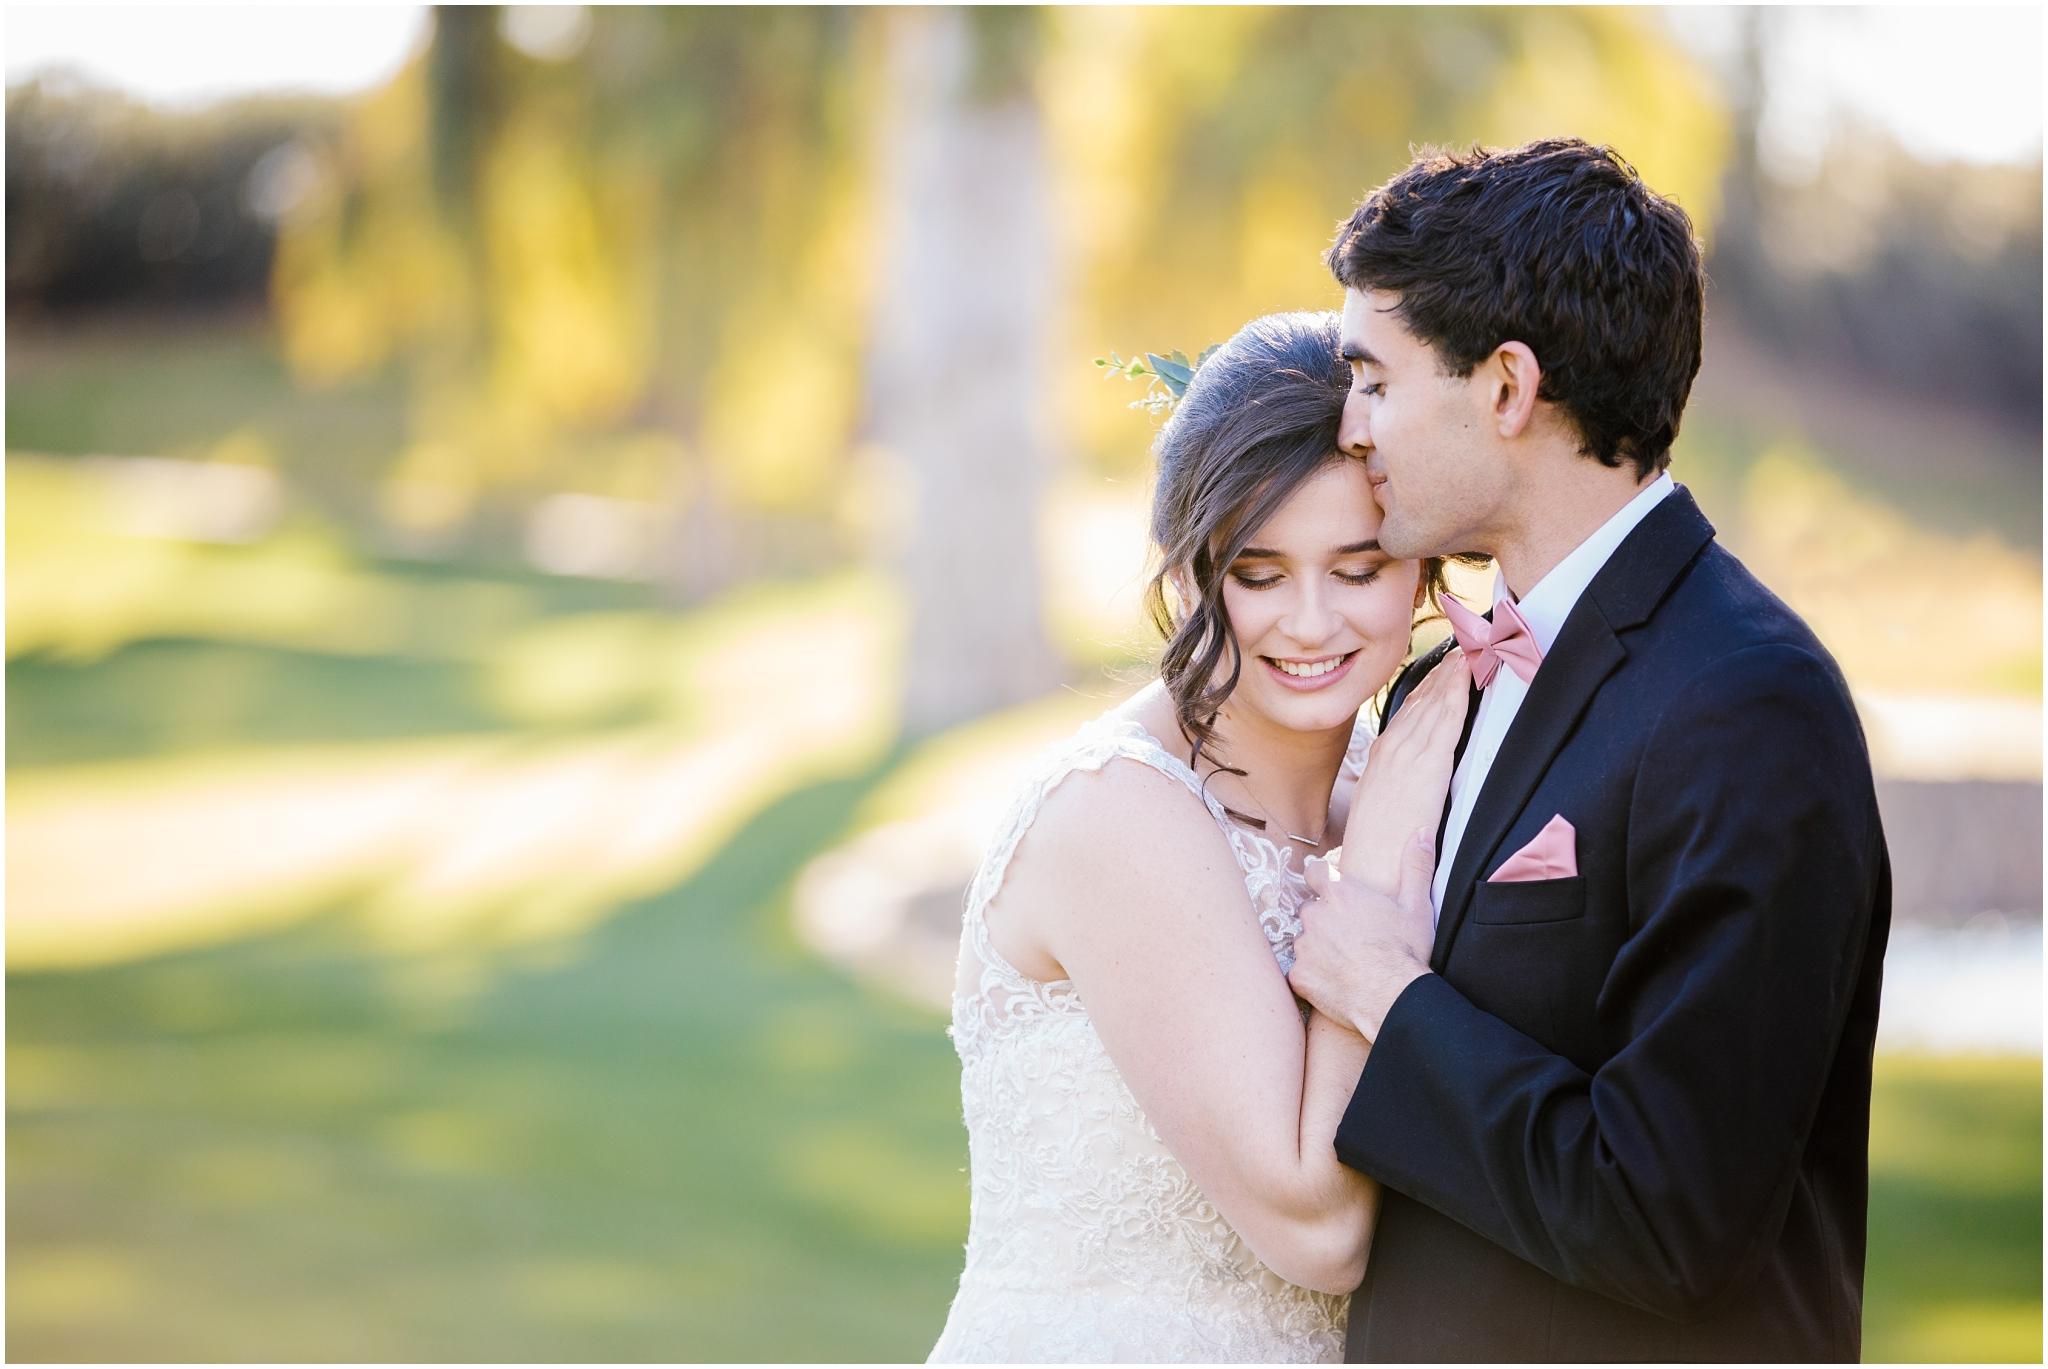 Marissa Nathan-8print_Lizzie-B-Imagery-Arizona-Wedding-Photographer-Salt-Lake-City-Temple-Park-City-Phoenix-Mesa-County-Club.jpg